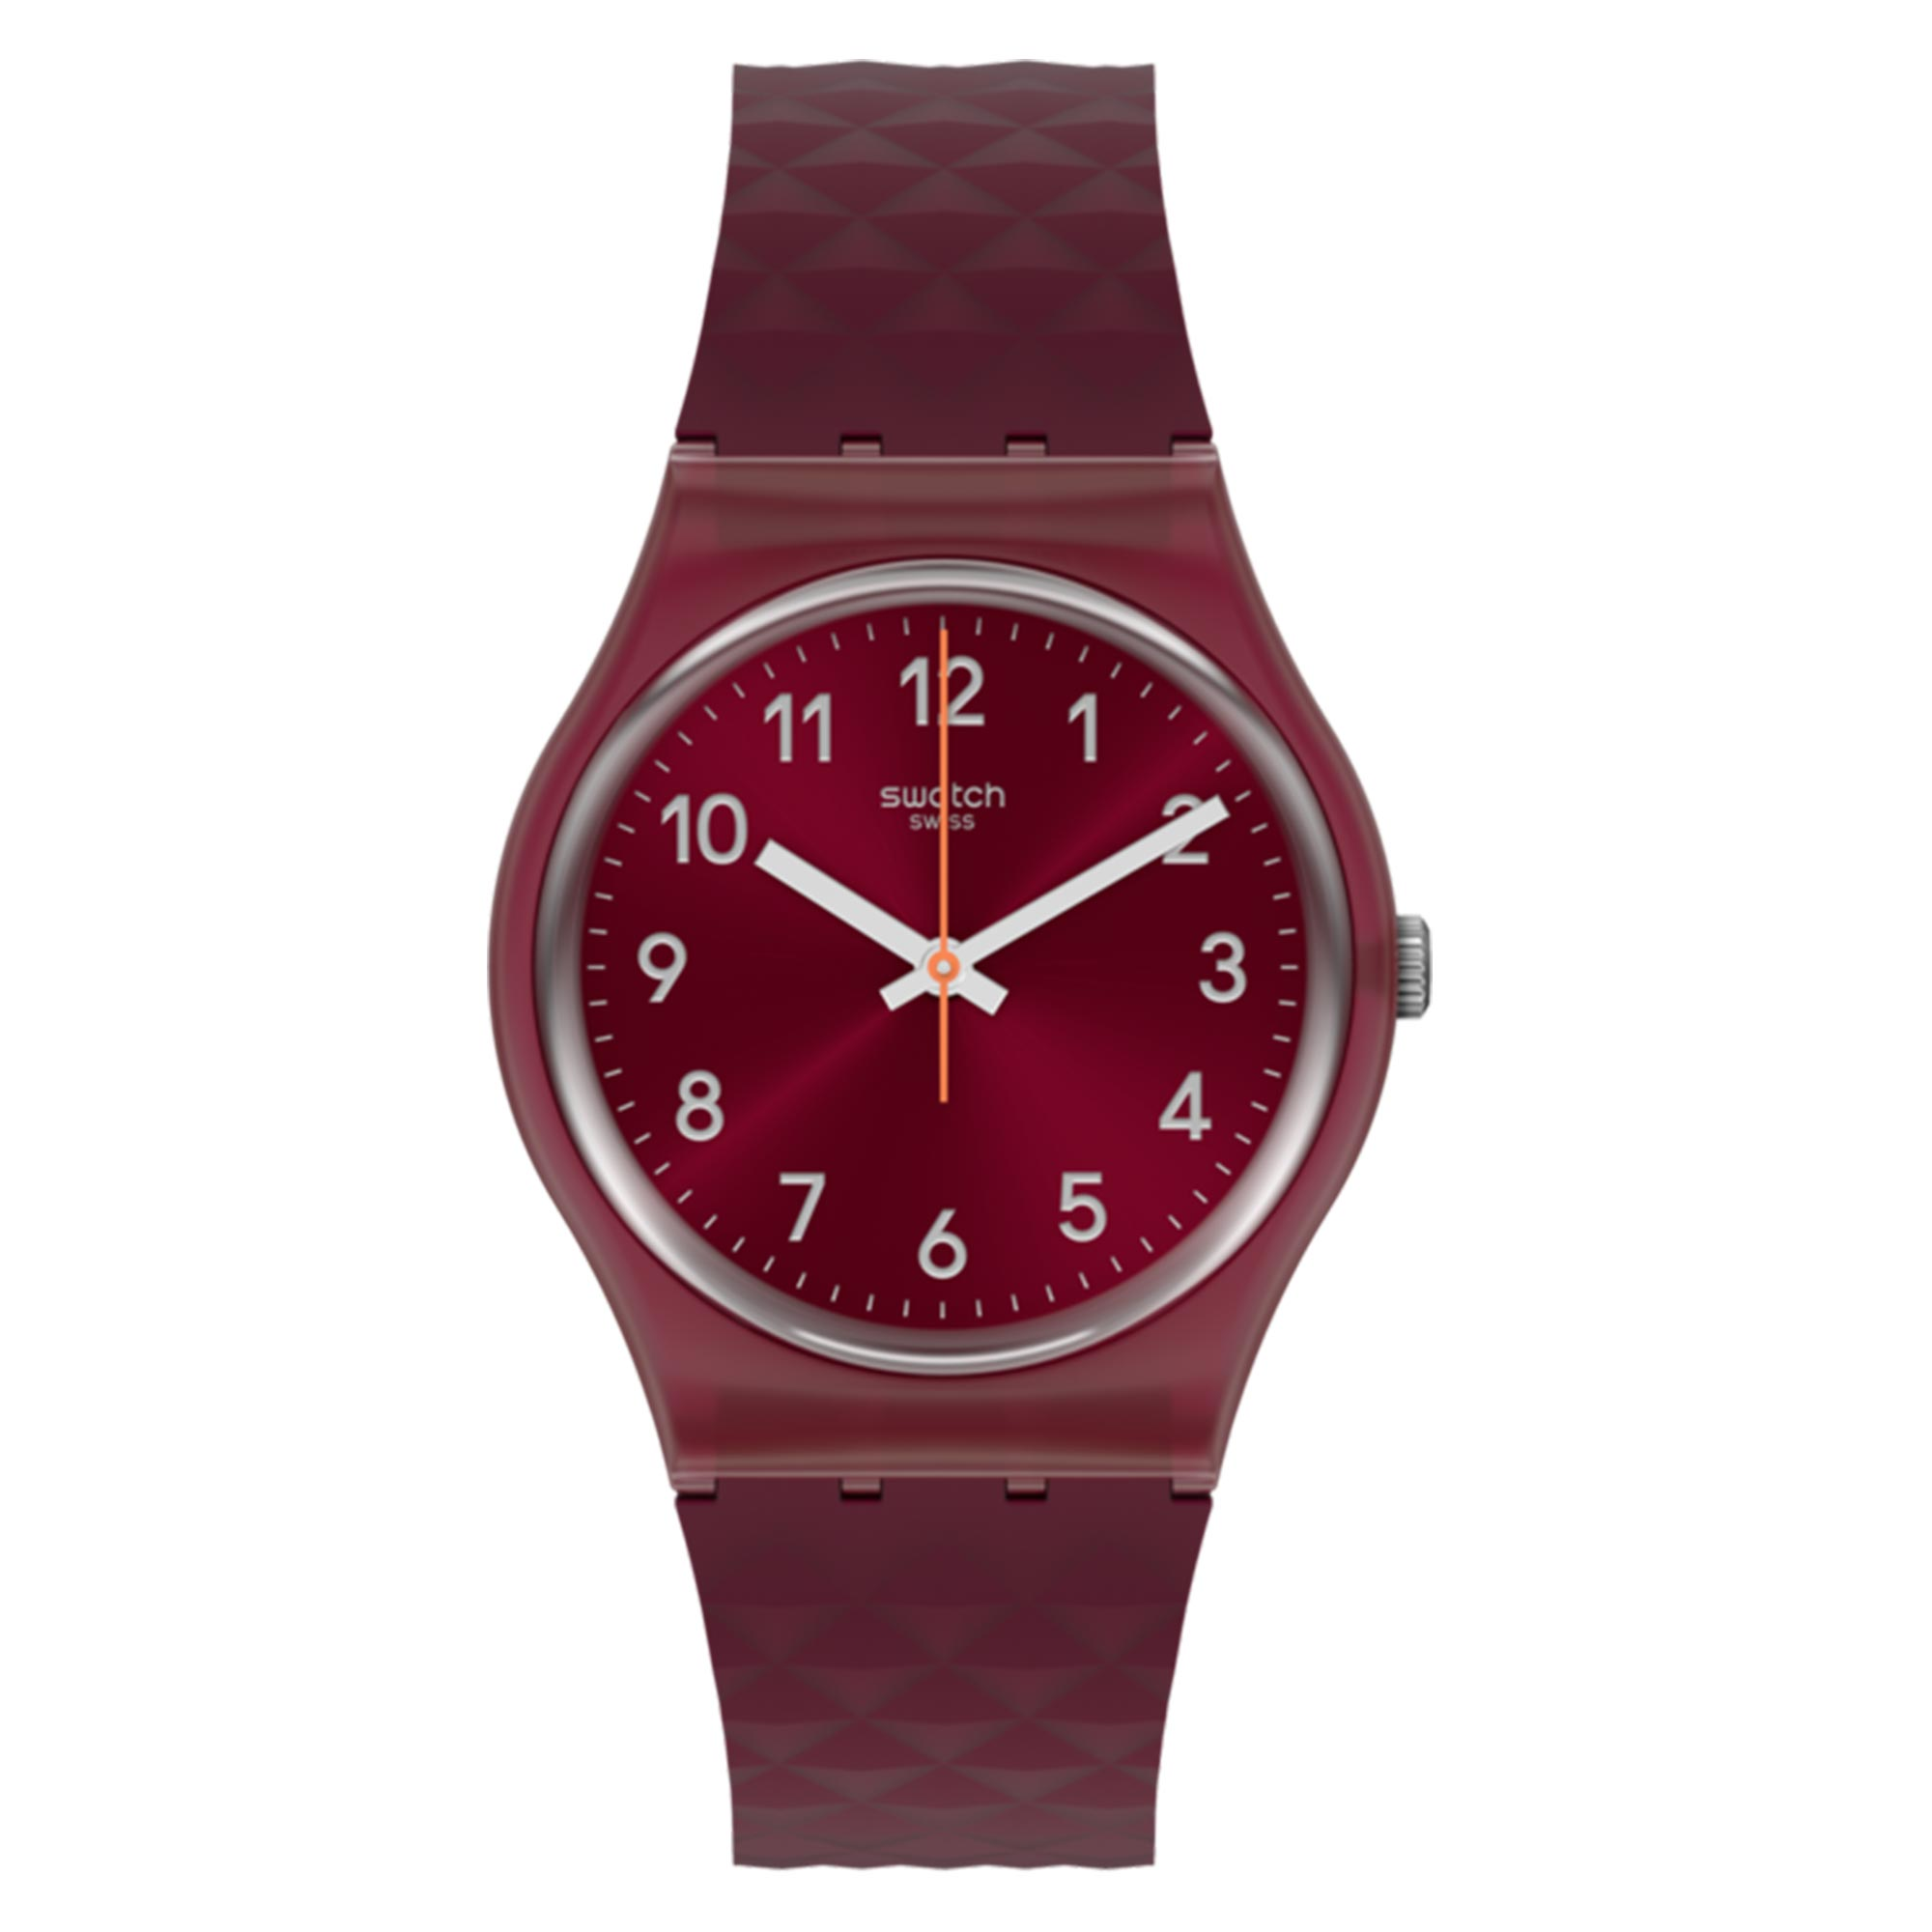 Swatch Rednel Quartz Movement Red Dial Plastic Strap Watch GR184